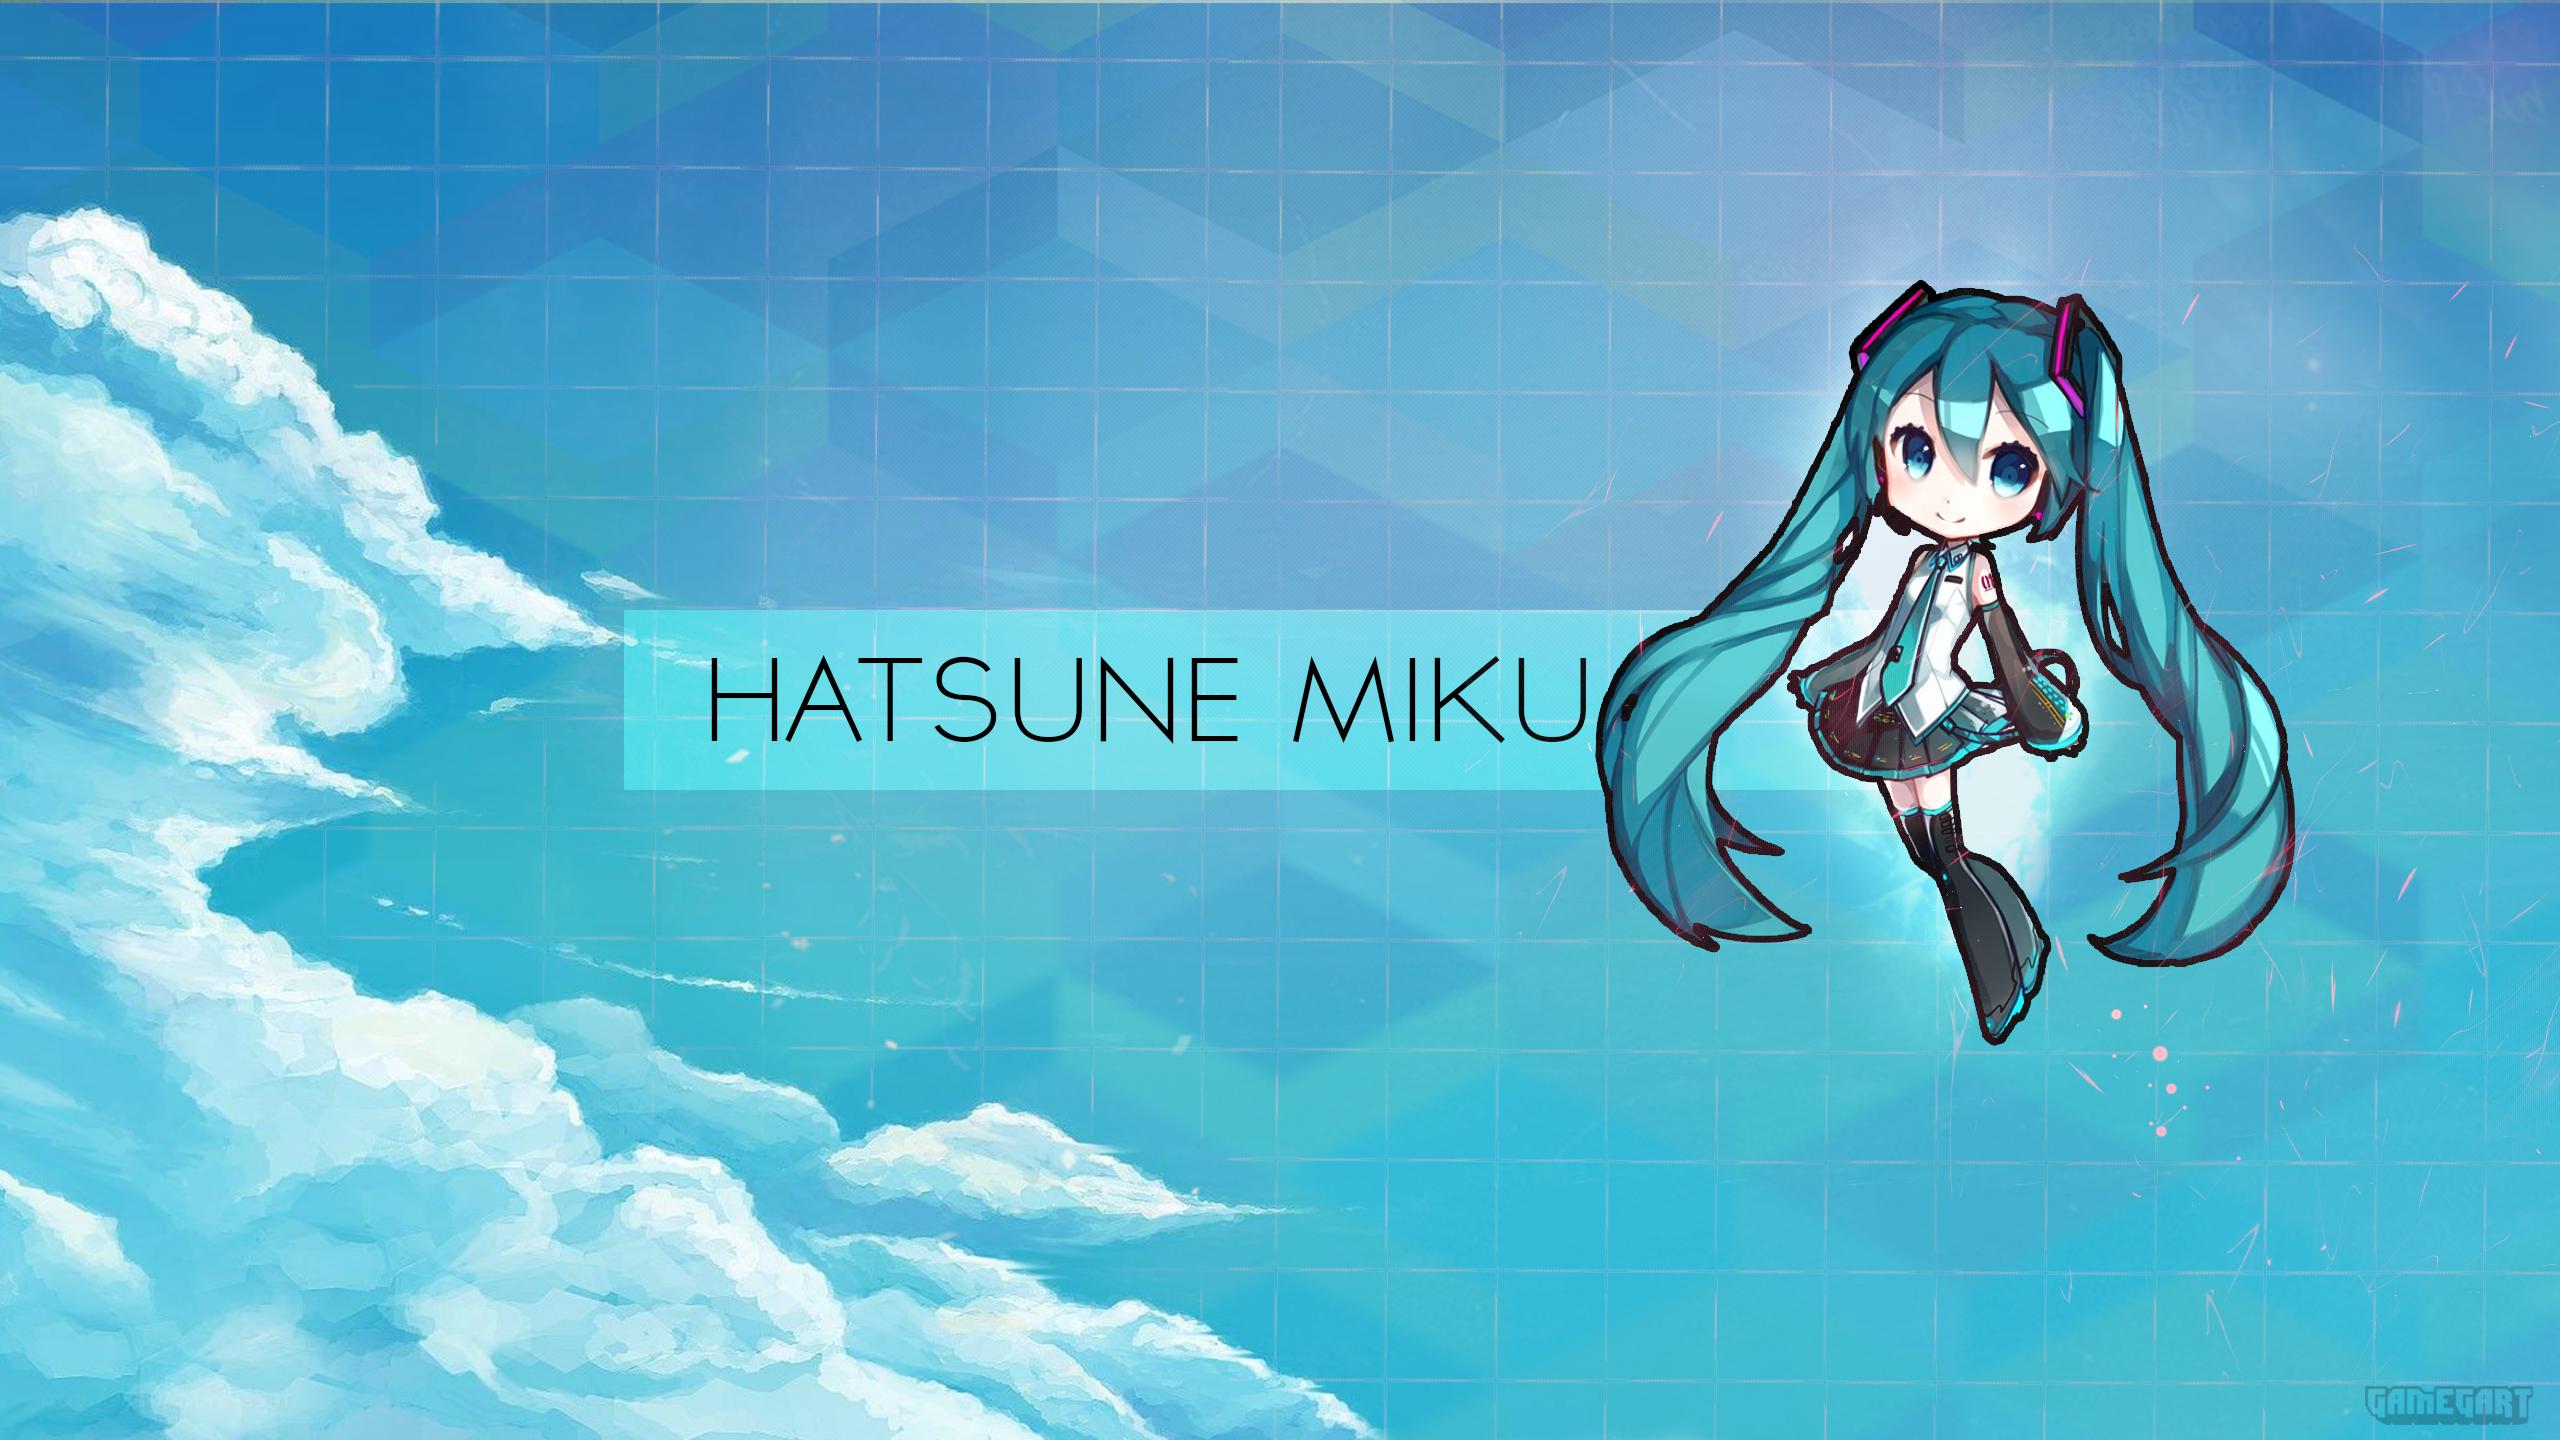 chibi hatsune miku phone wallpaper - photo #21